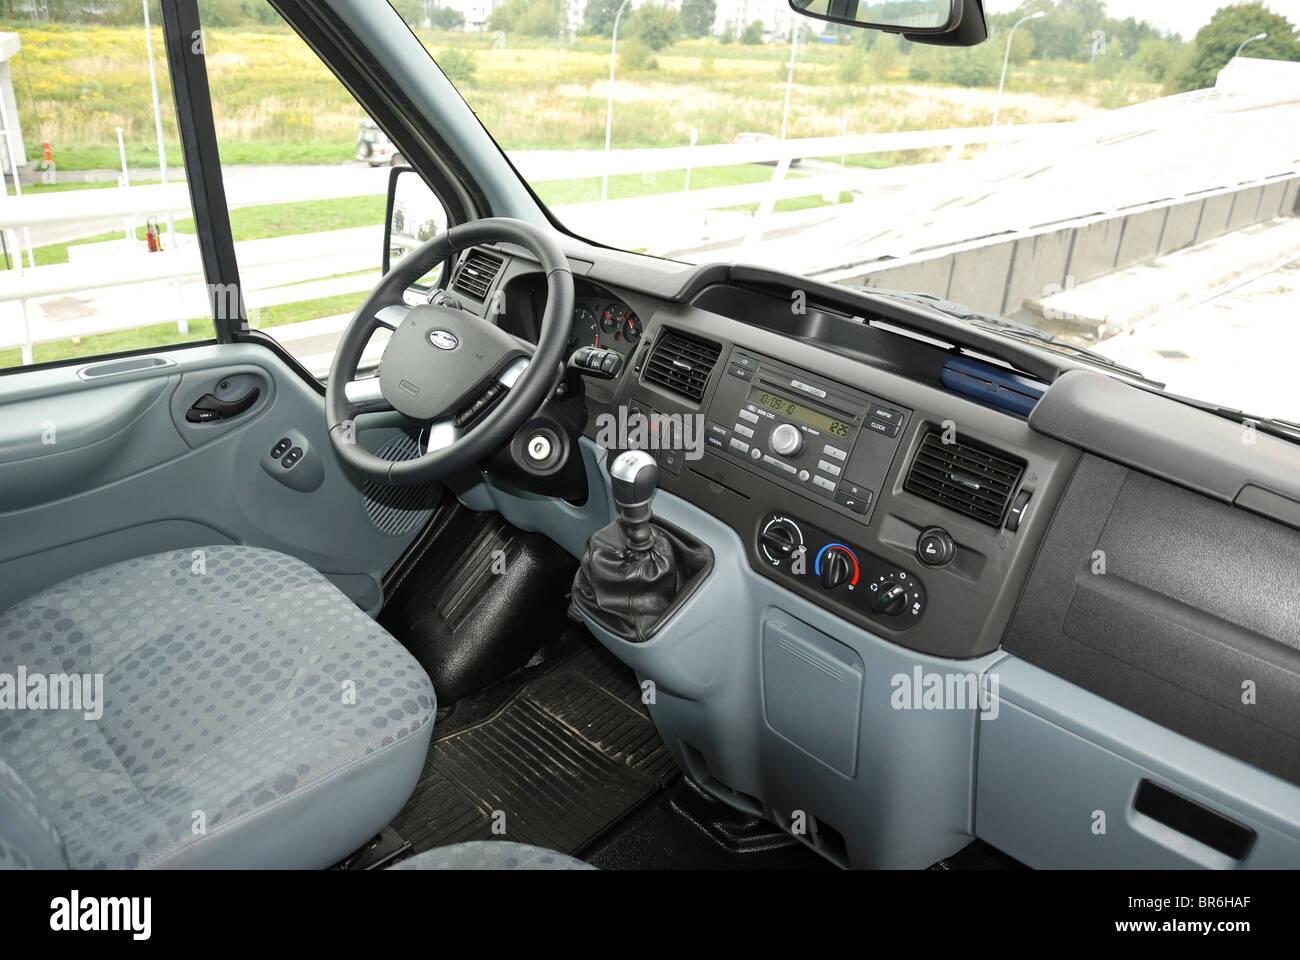 Ford Transit 2.4 TDCi AWD 140 T350 Trend panel van - Chill - MWB Stock Photo: 31492791 - Alamy